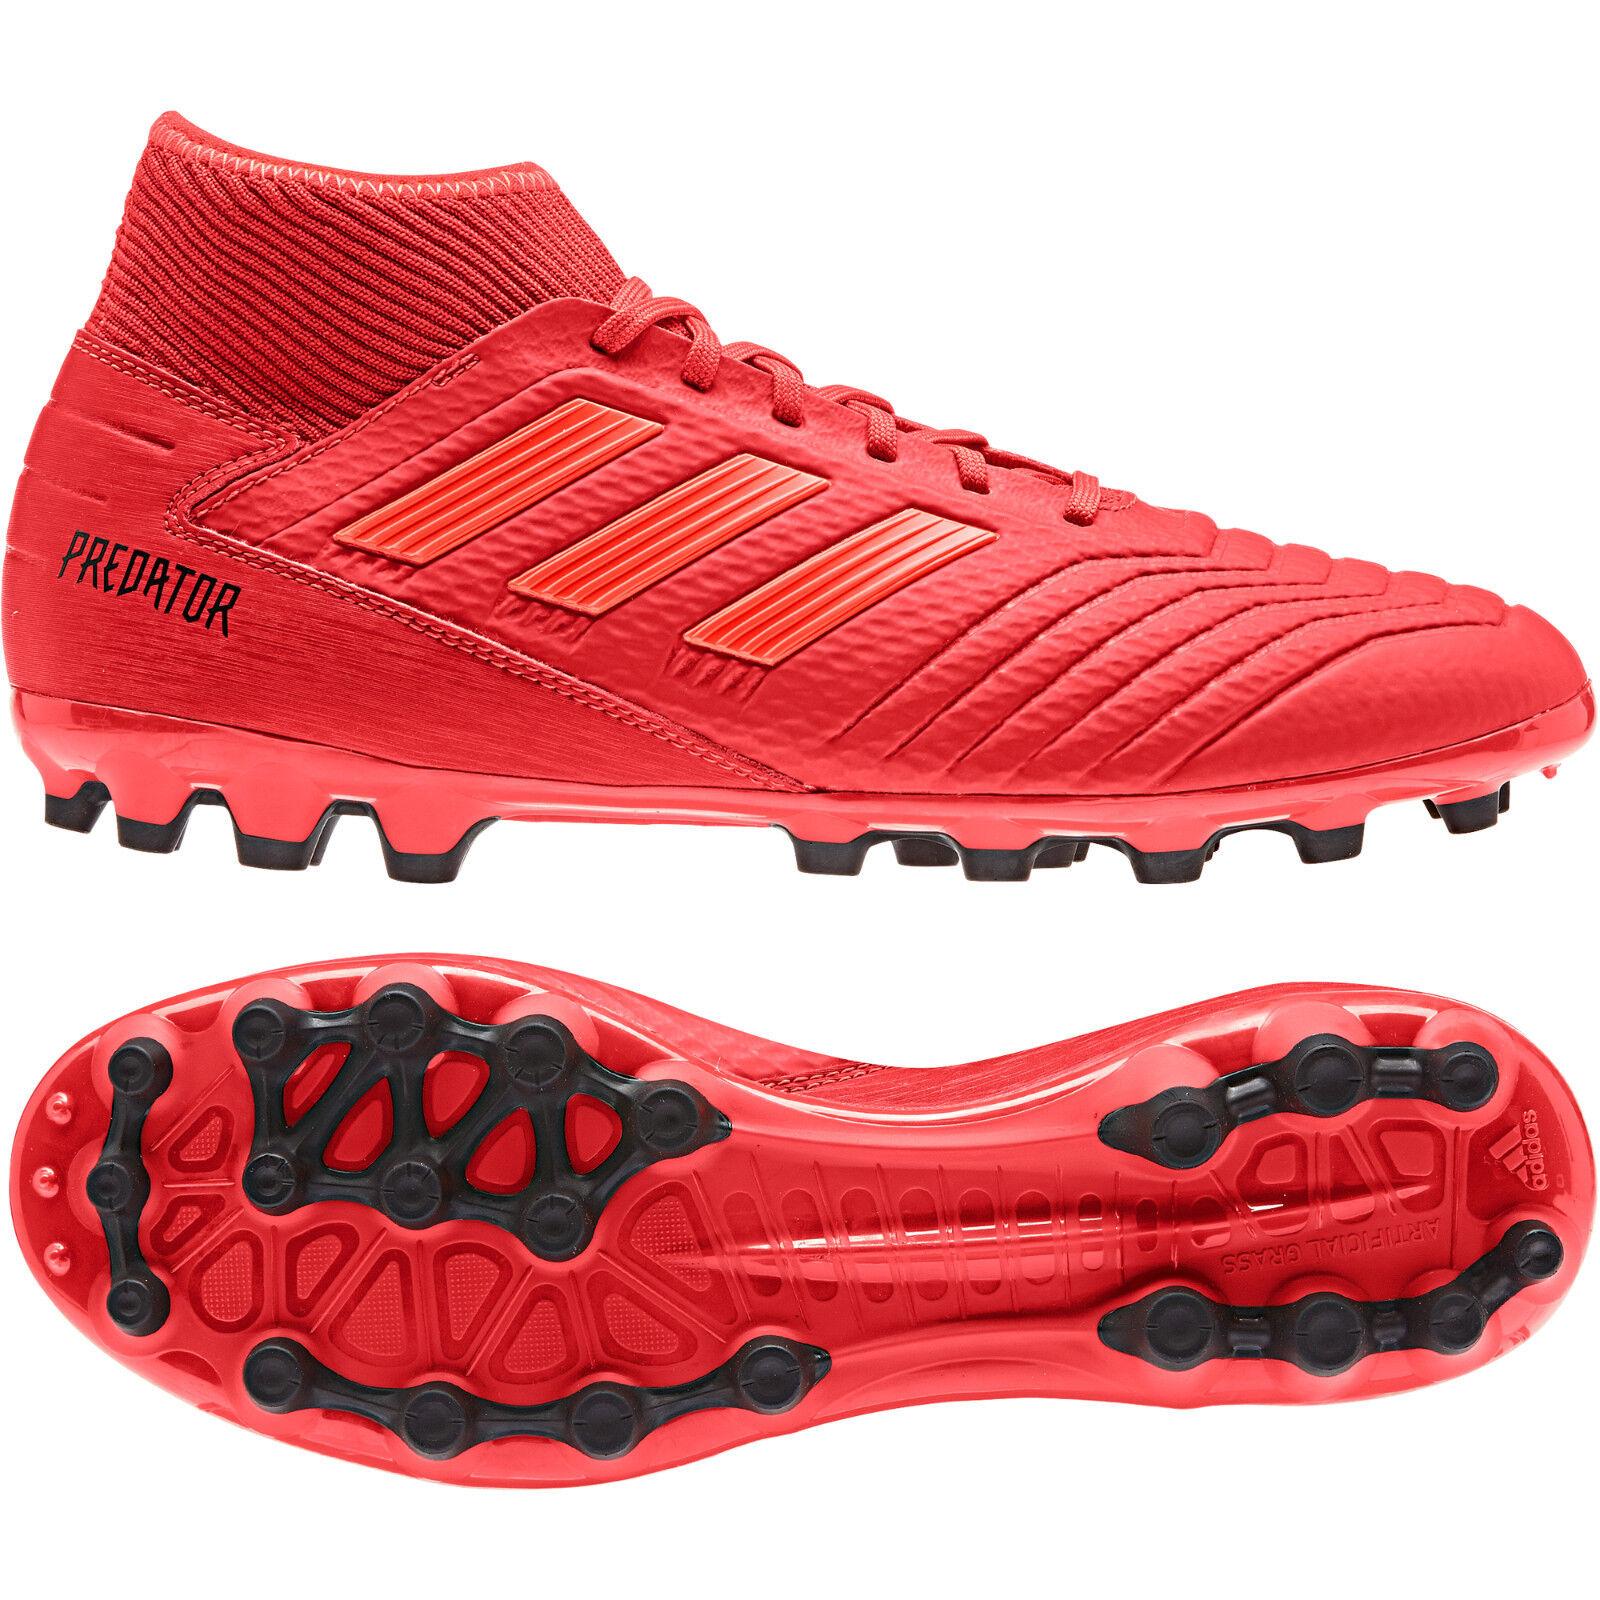 Adidas ProtATOR 19.3 AG       Art. D97944 f6d08f